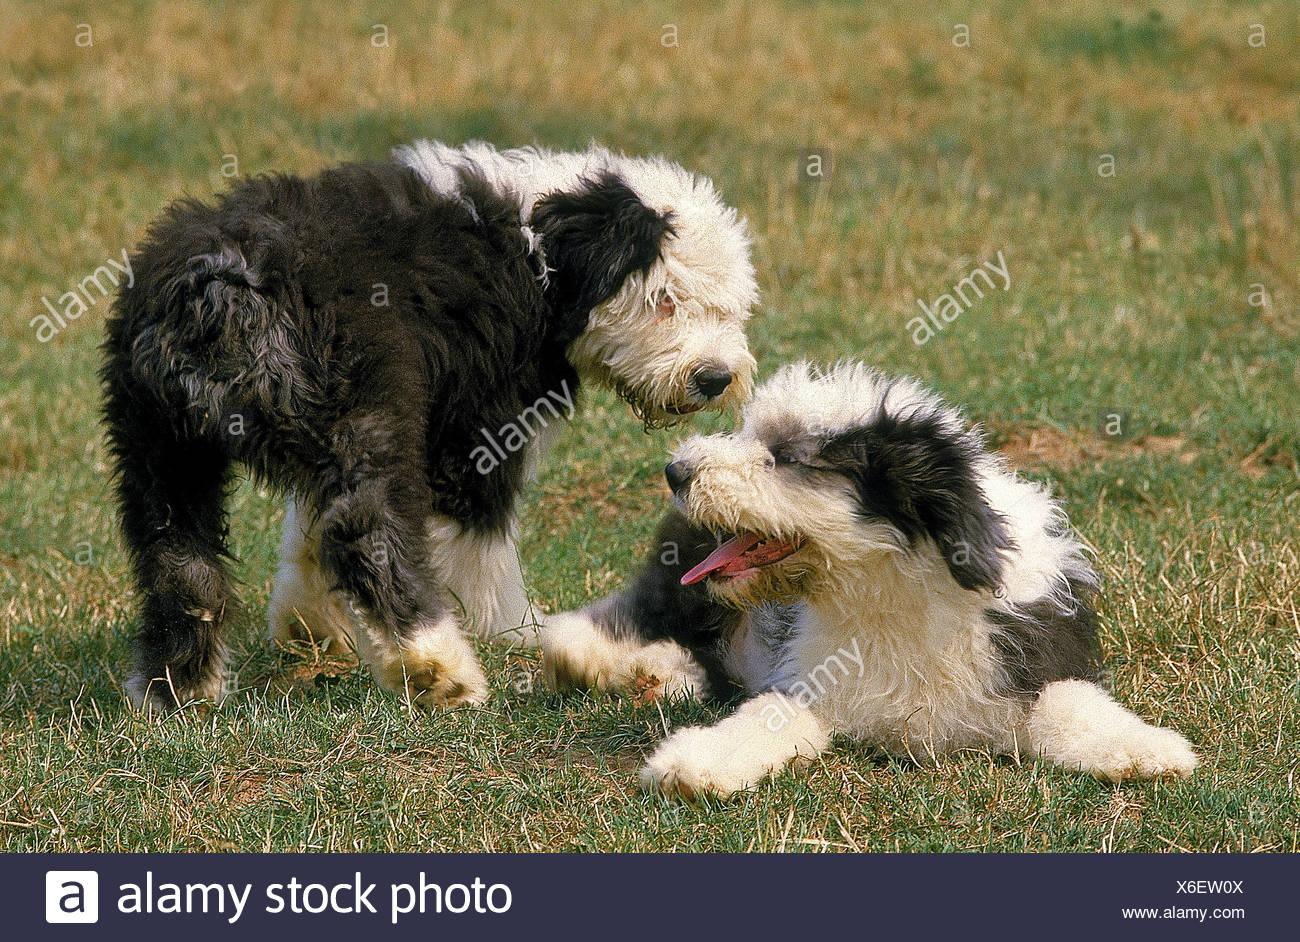 Bobtail Old English Sheepdog Puppy Stock Photos & Bobtail